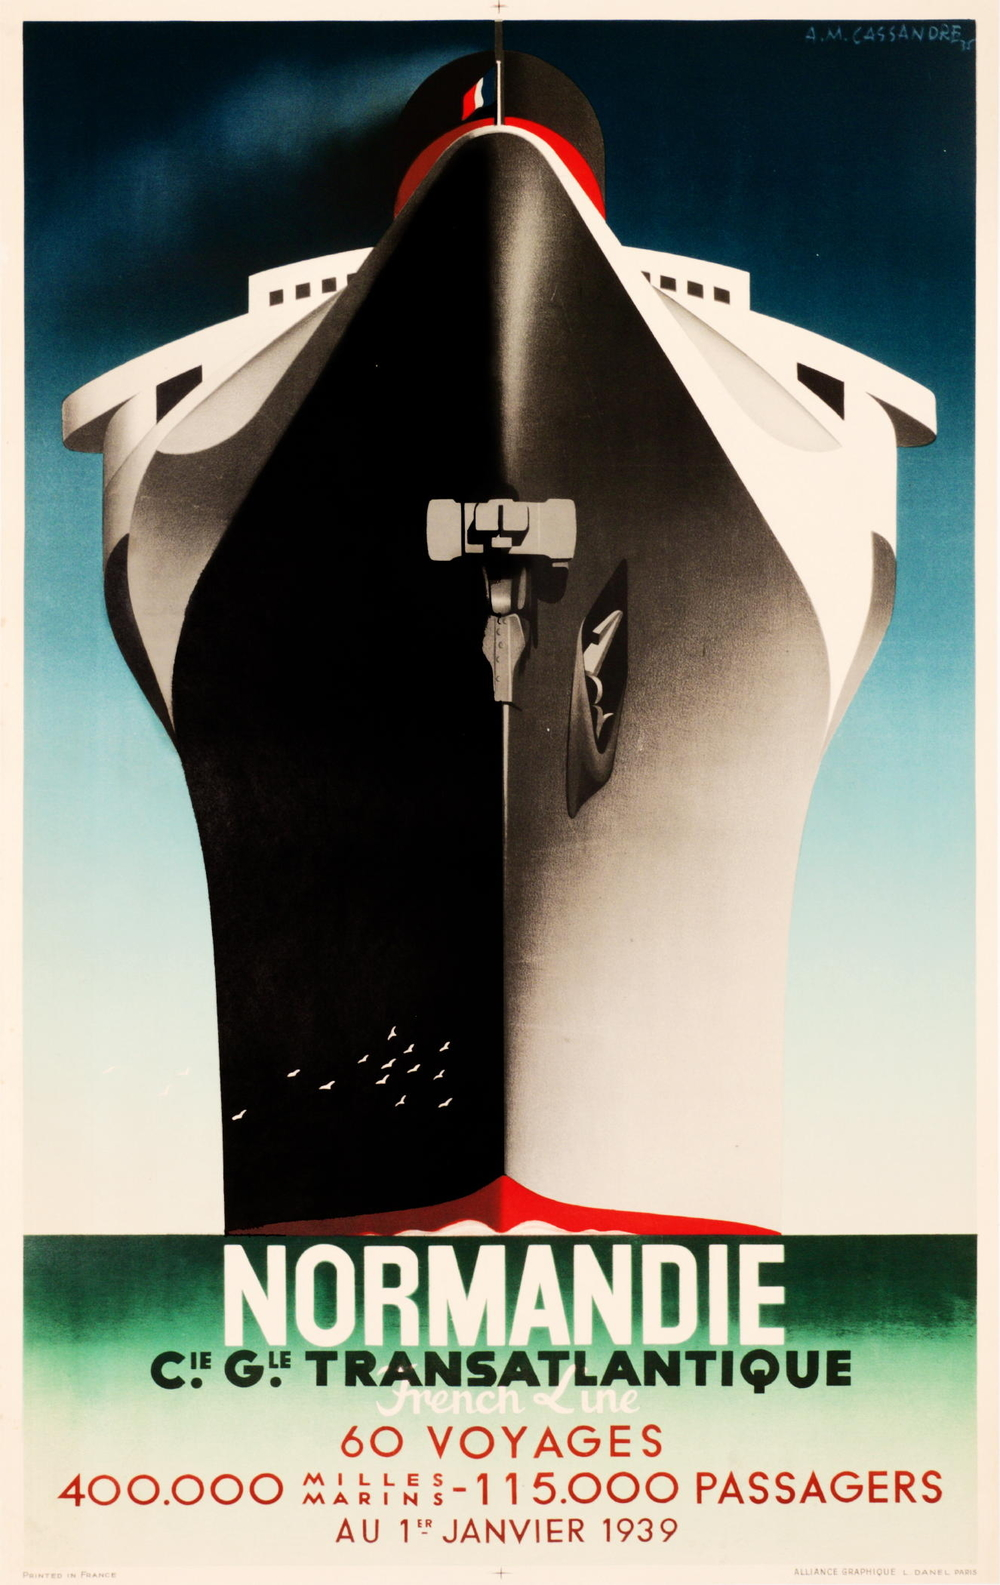 Original Poster, circa 1935